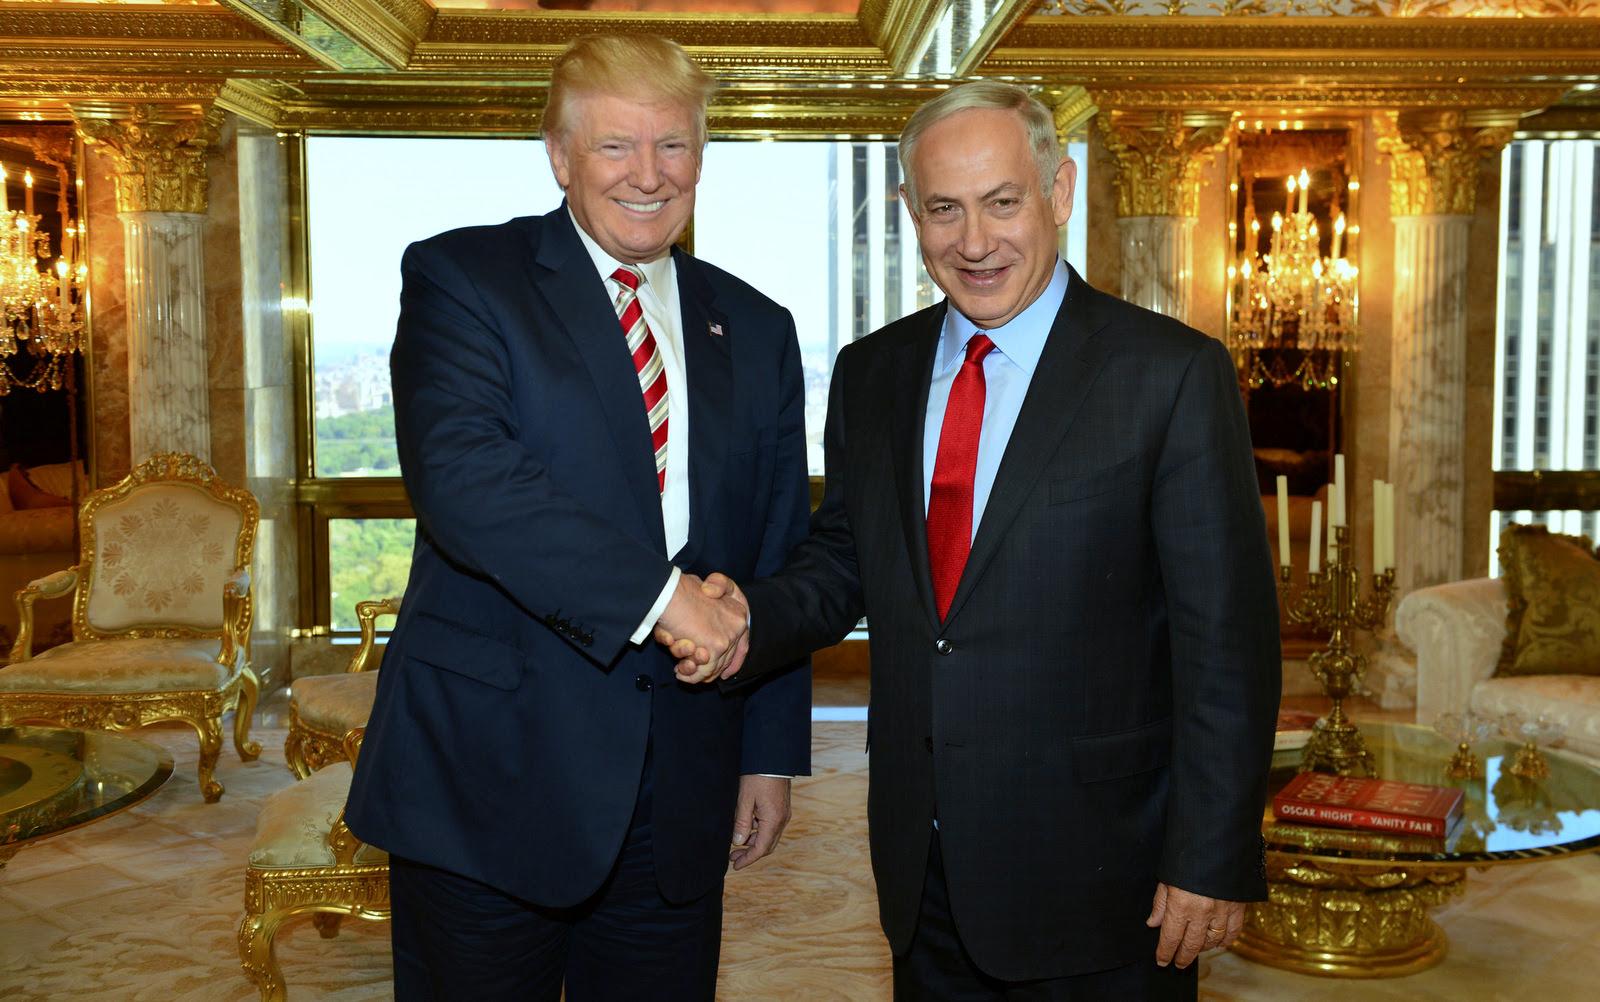 In this Sept. 25, 2016 photo, Donald Trump shakes hand with Israeli Prime Minister Benjamin Netanyahu in New York.(Kobi Gideon-GPO/AP)